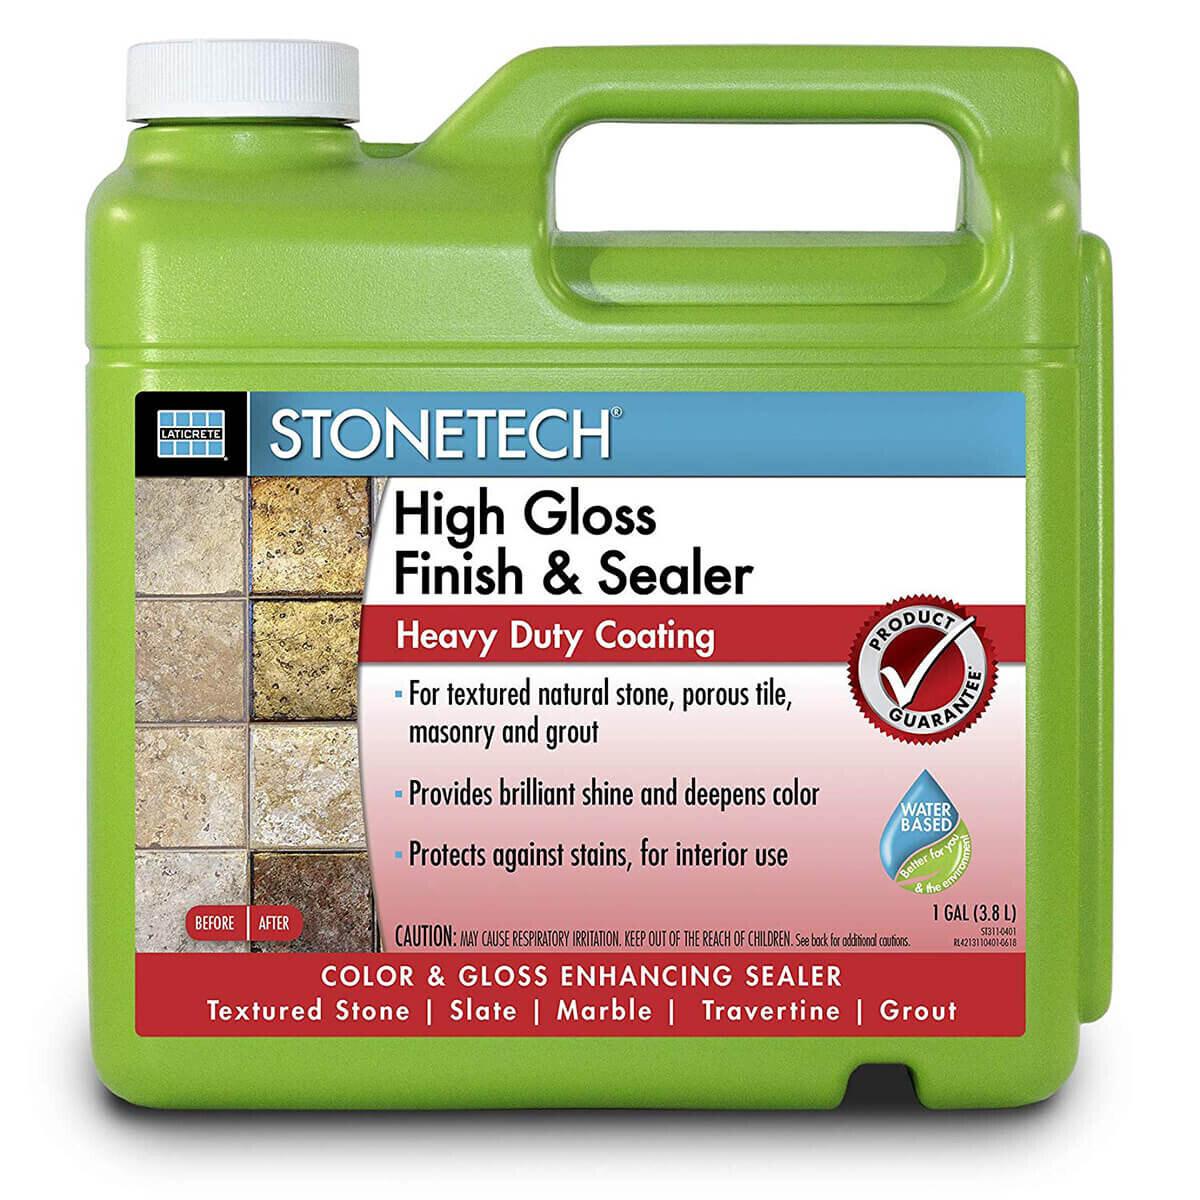 Stone Tech High Gloss Finishing Sealer - 1 Gallon